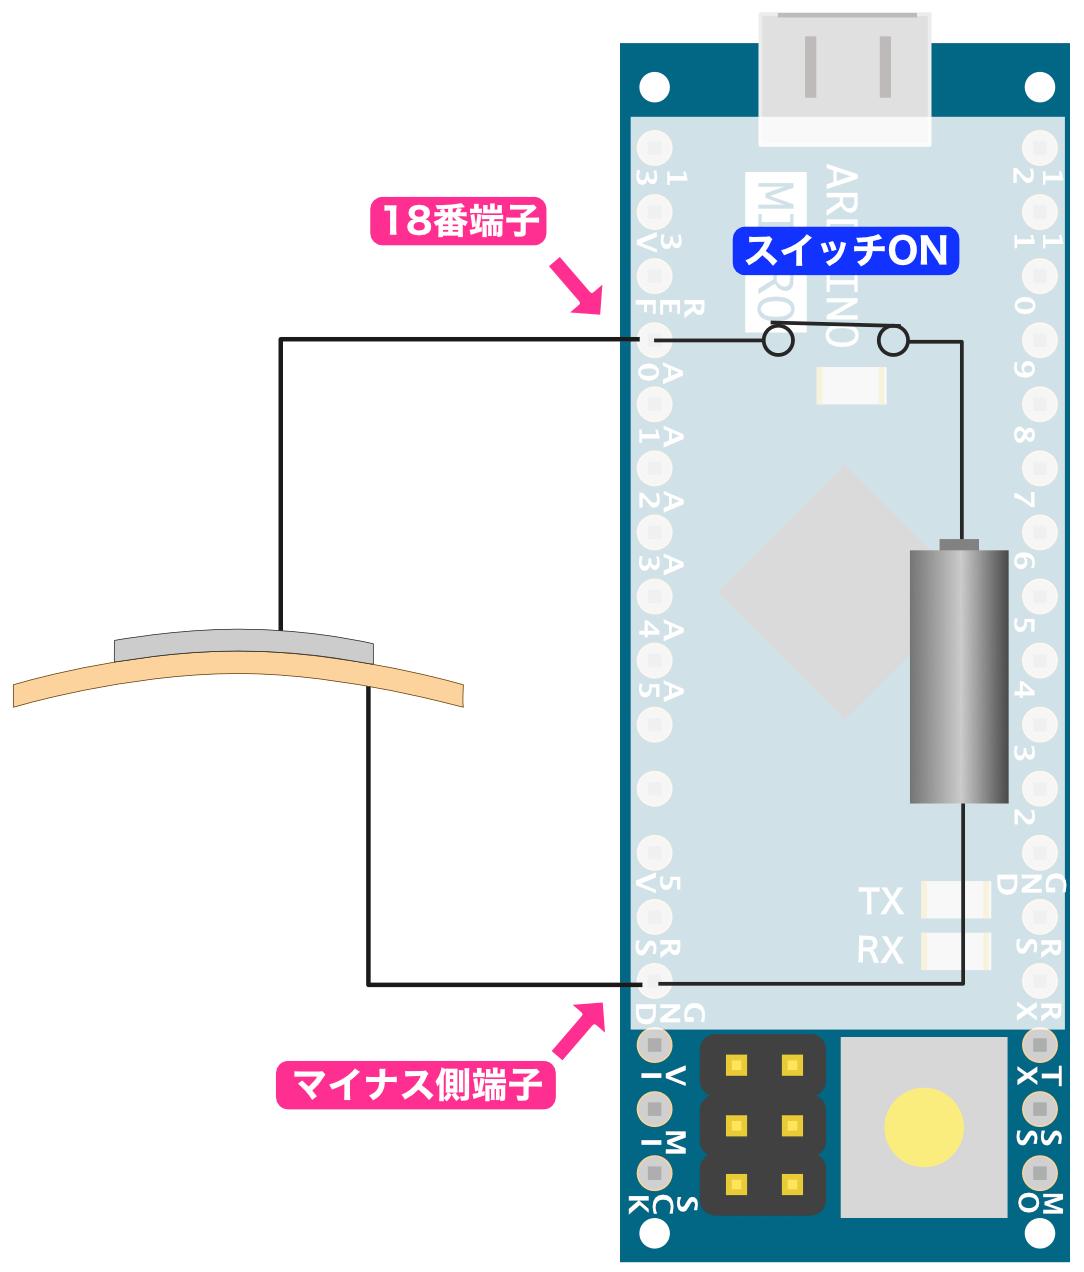 Arduino18番端子スピーカーON